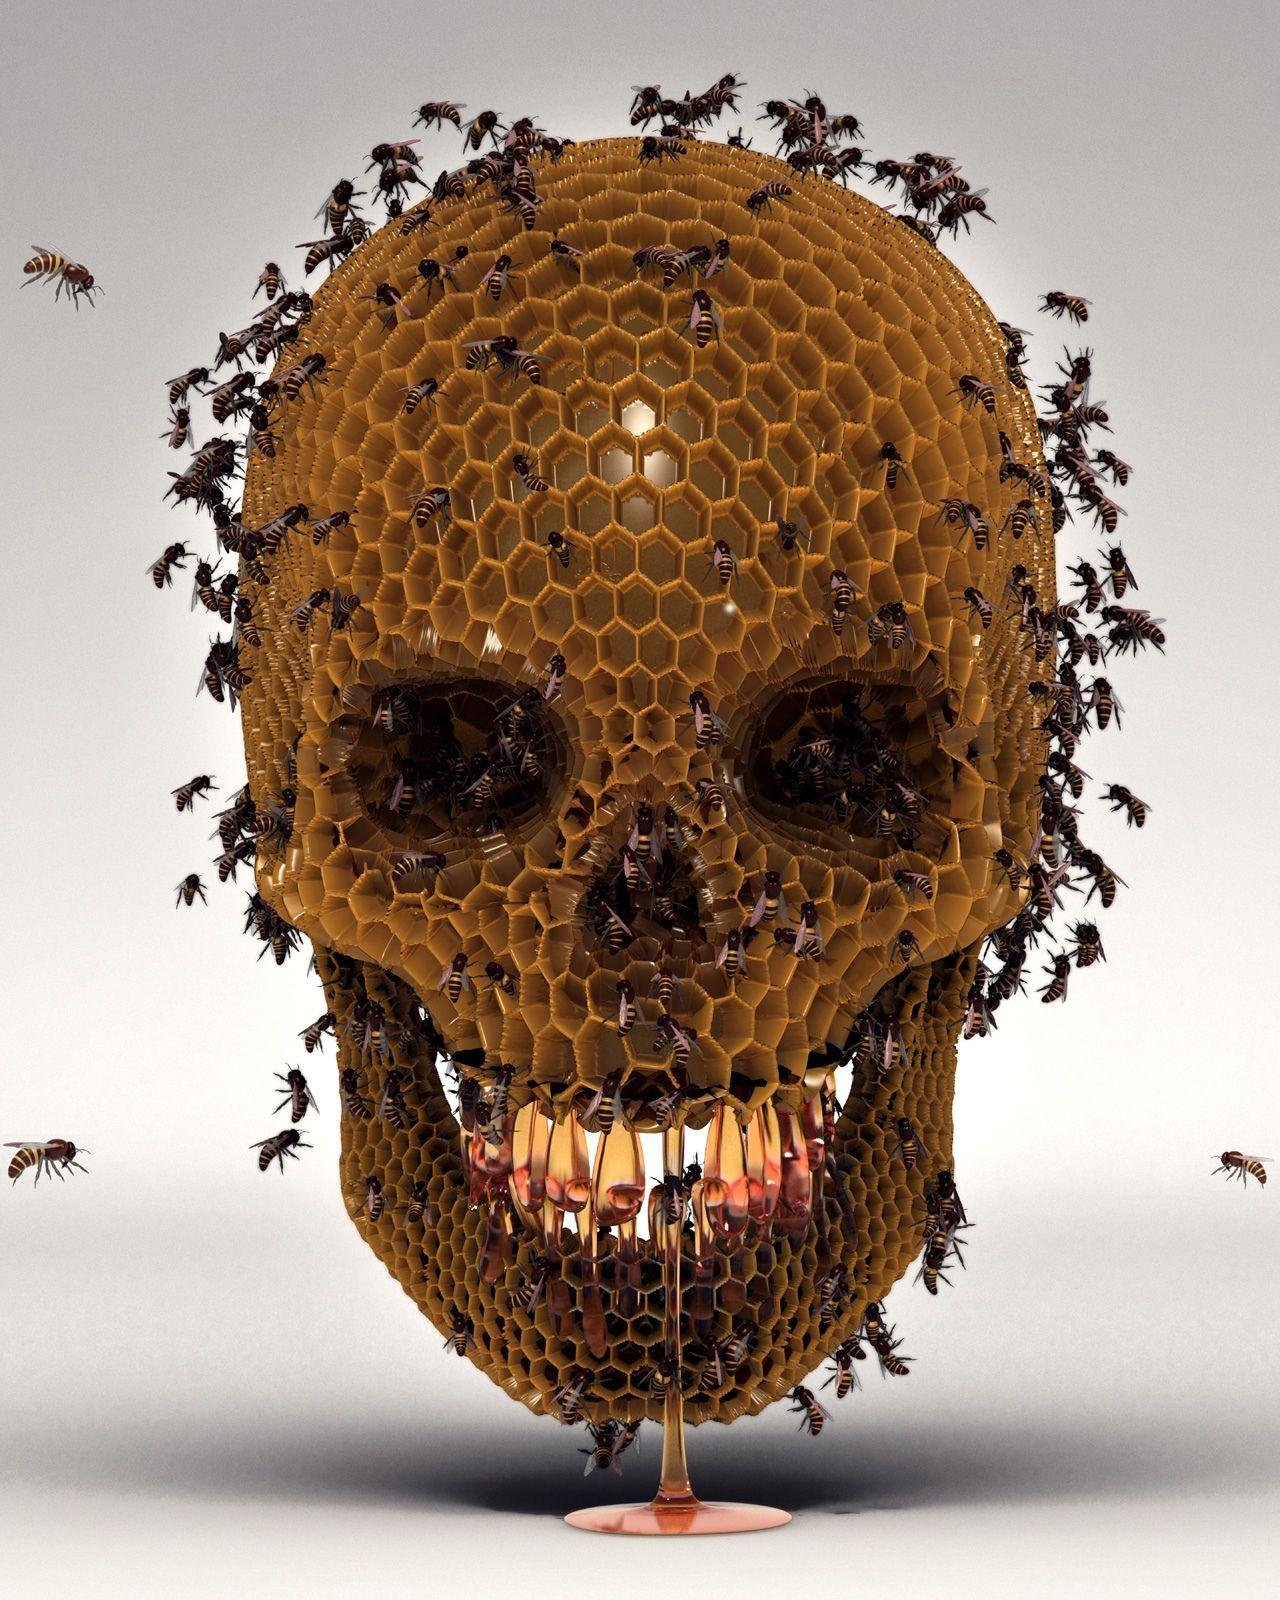 b4ab1b876f6 Luke Dwyer   Skull hive.